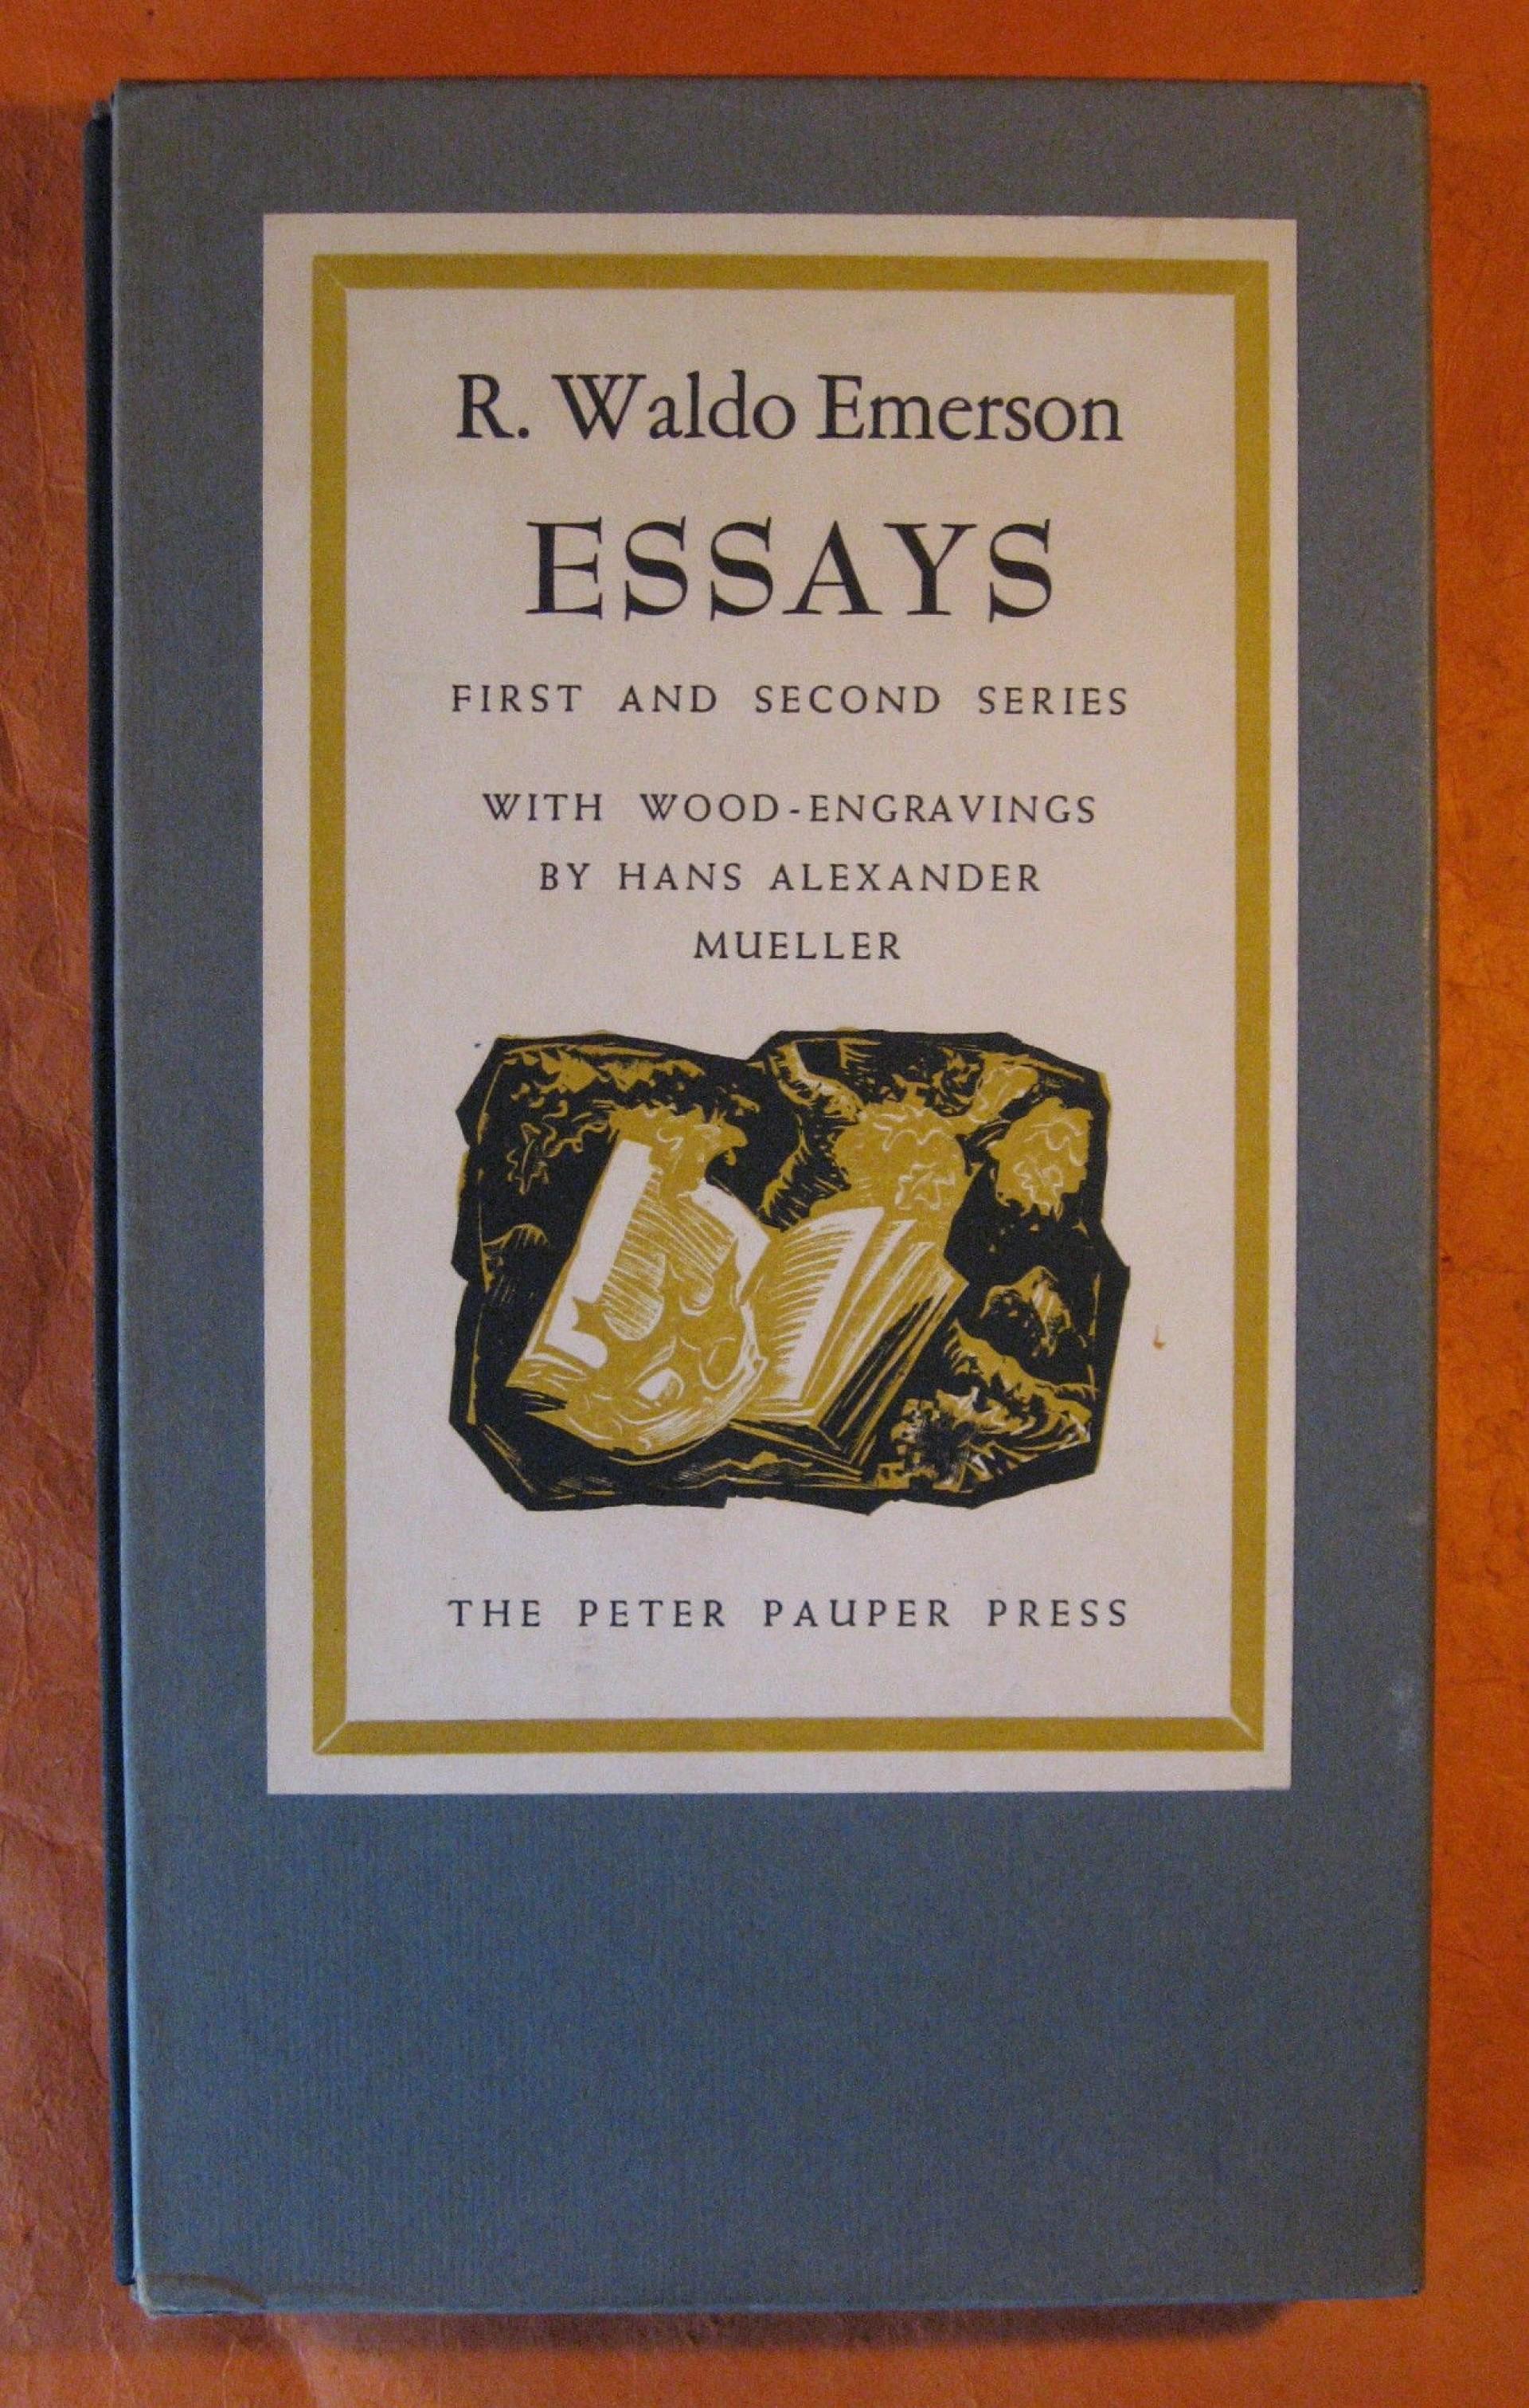 012 Essays First Series X Essay Stunning Emerson Pdf Shelburne Publisher 1920